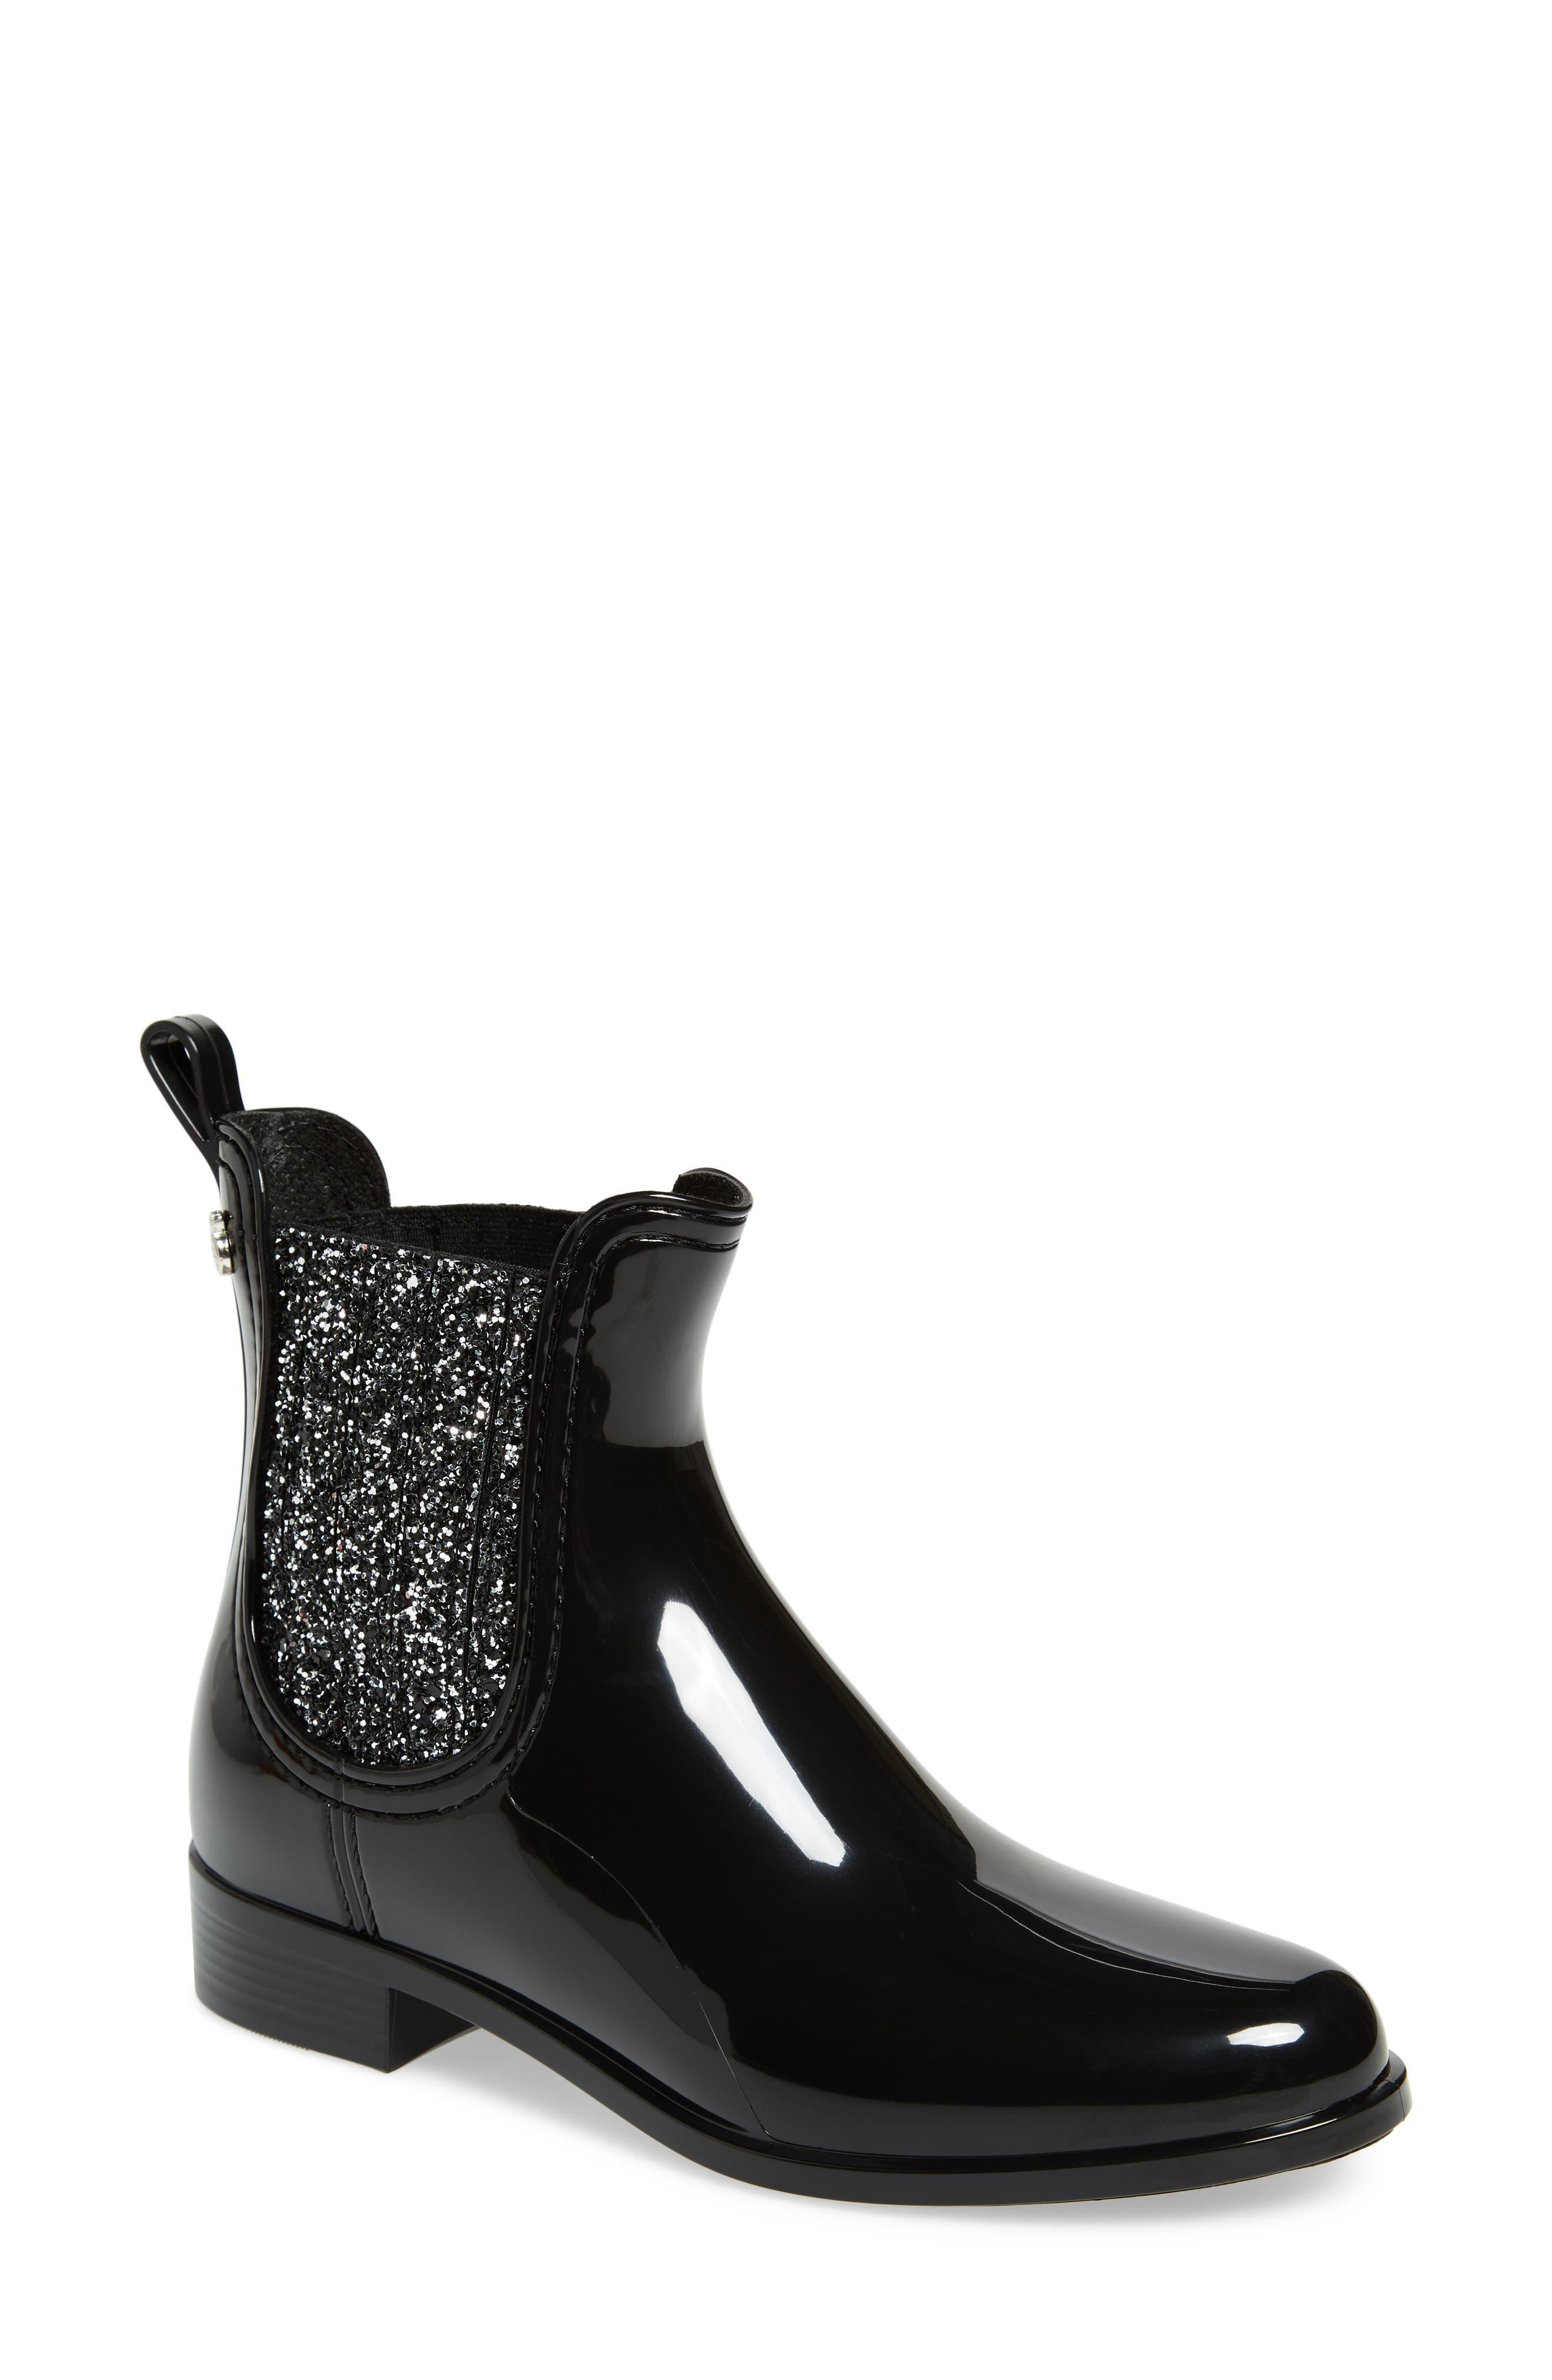 LEMON JELLY Sardenha Rain Boot, Main, color, 001